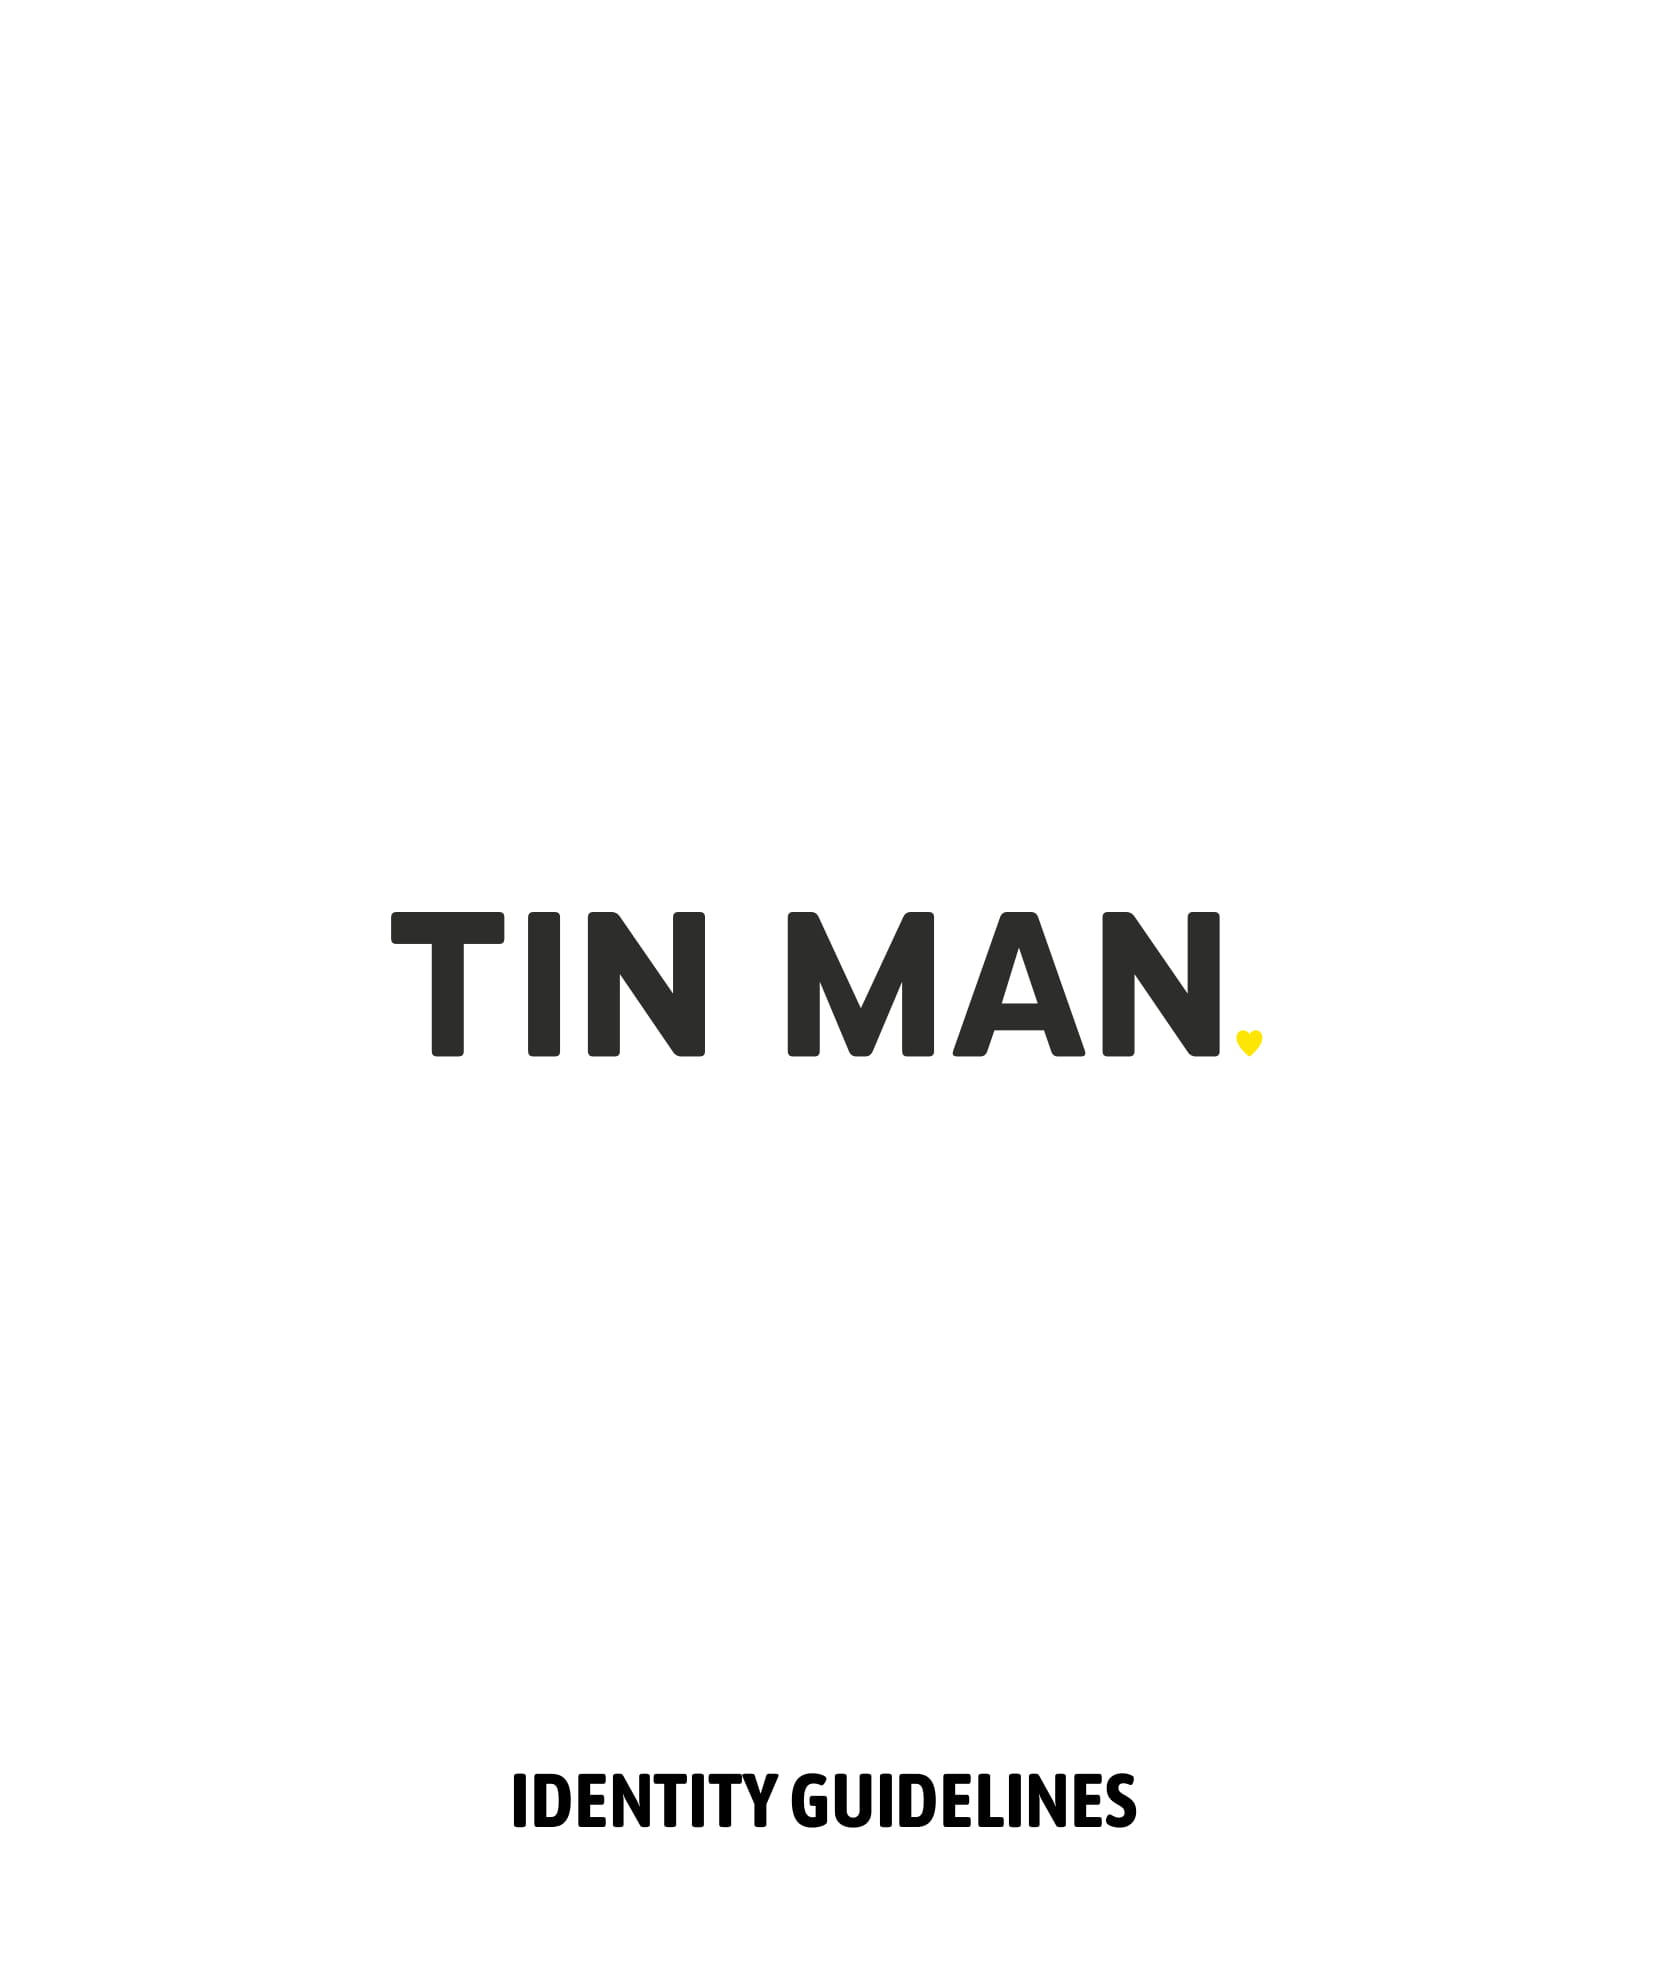 tinman_identityguidelines-01.jpg